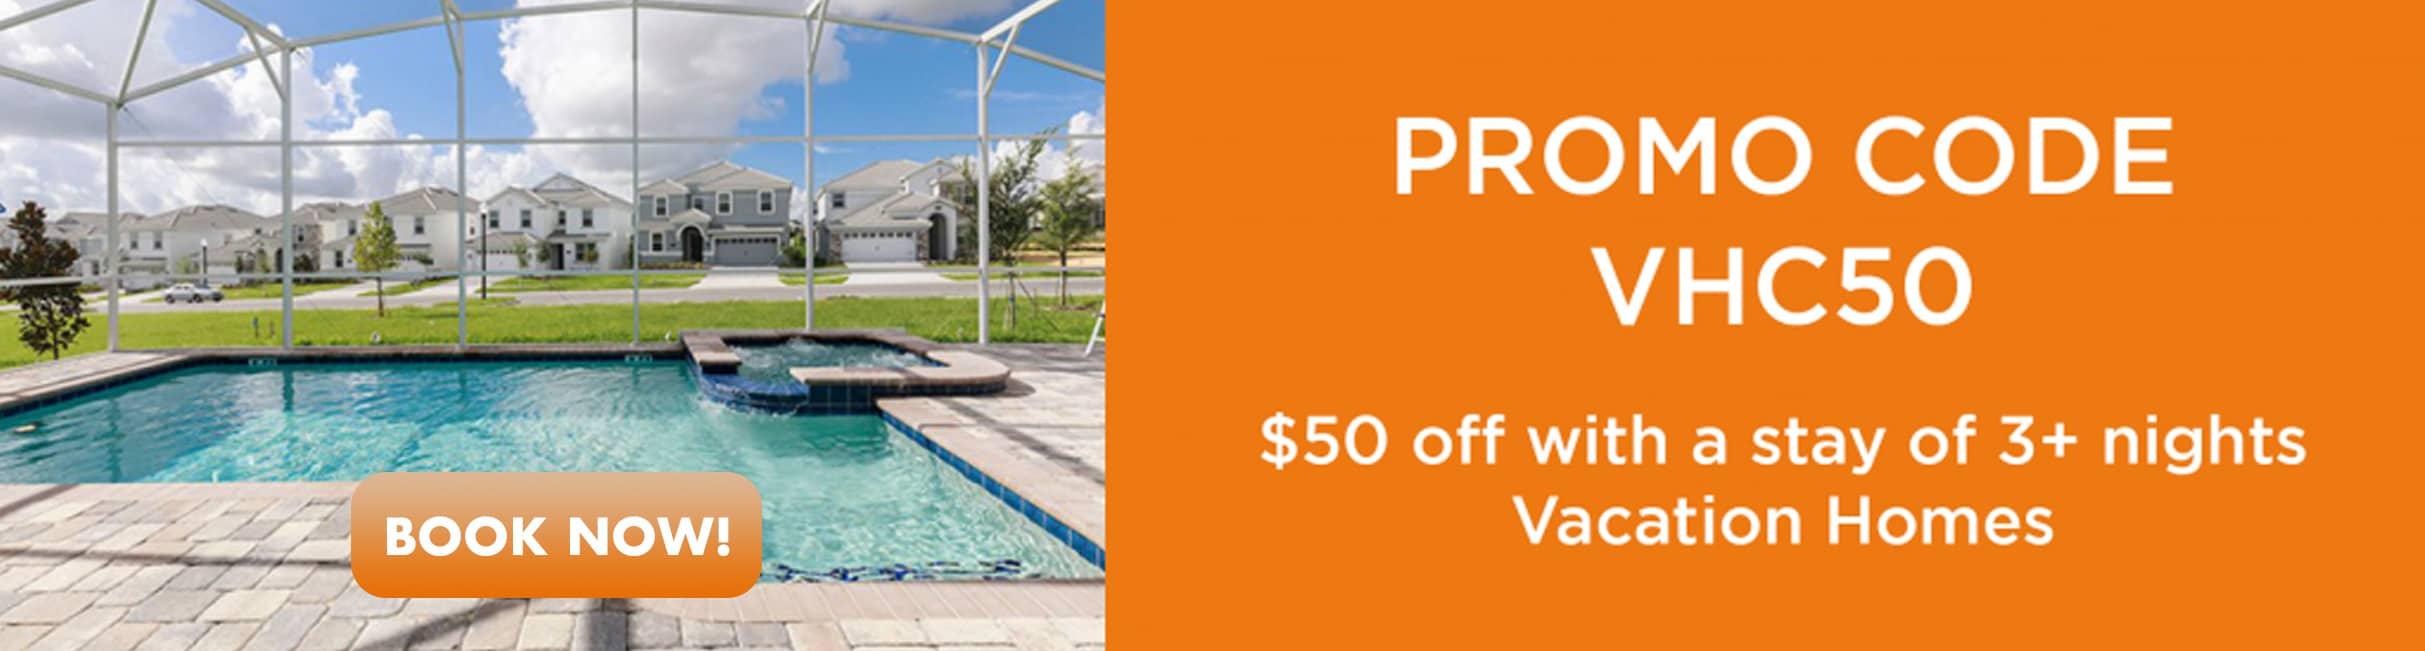 Promo Code 50% off Orlando Vacation Homes